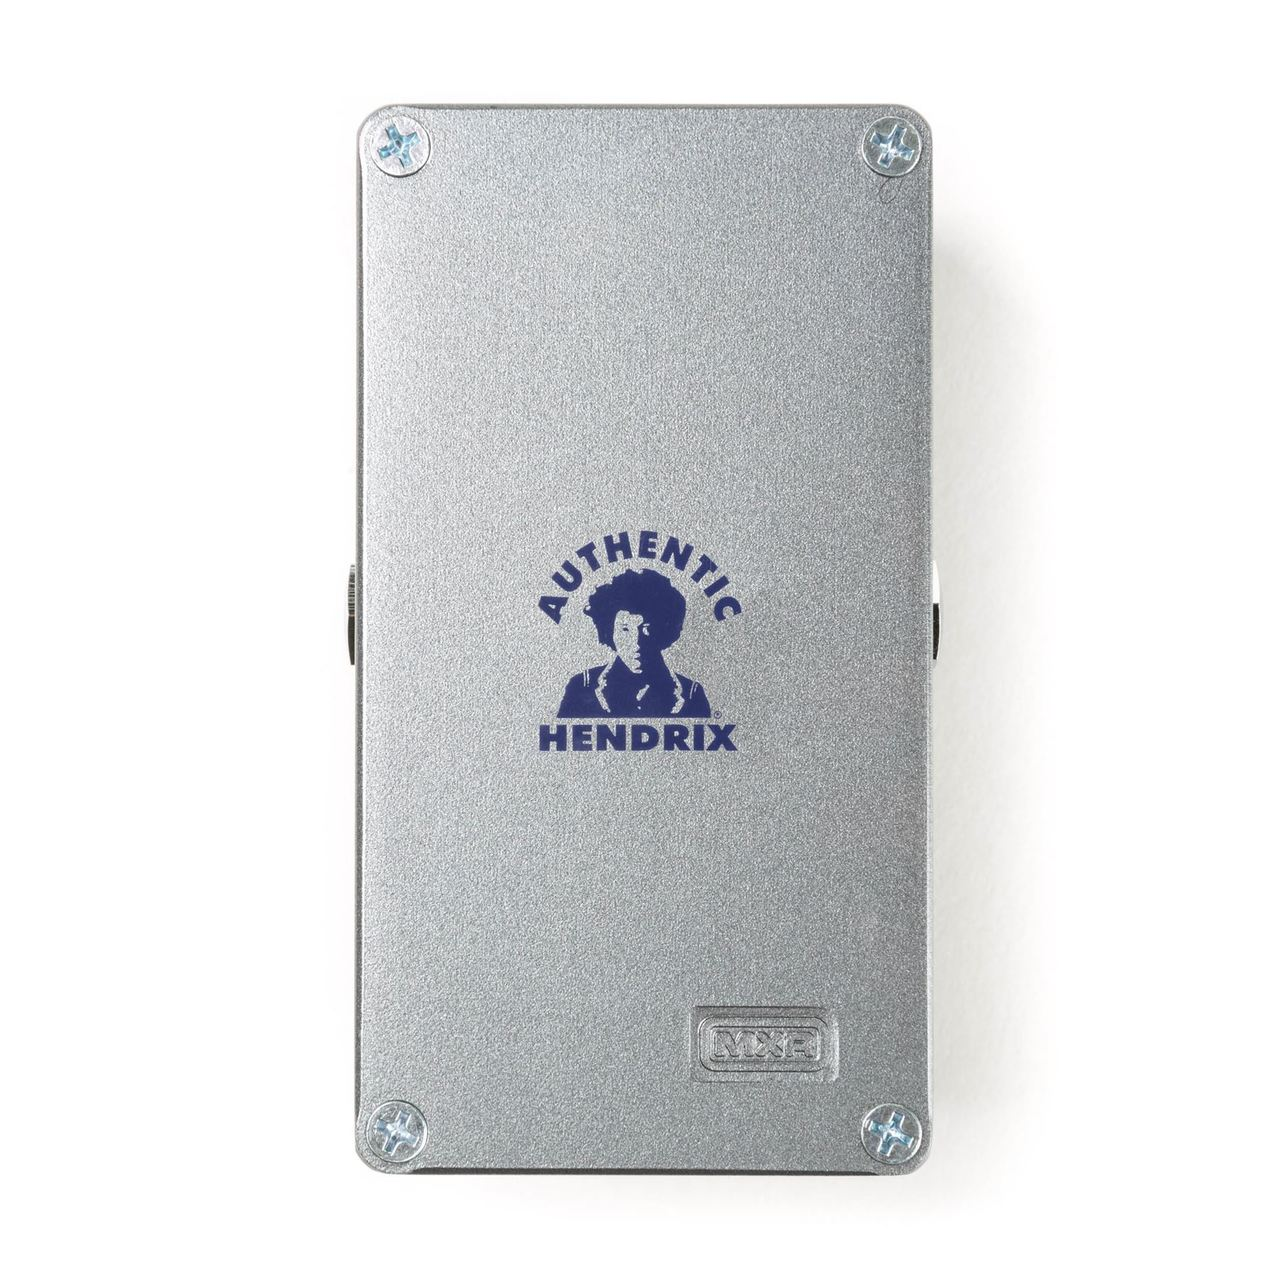 Dunlop JHM6 Limited Edition Jimi Hendrix Octavio fuzz / octave pedal